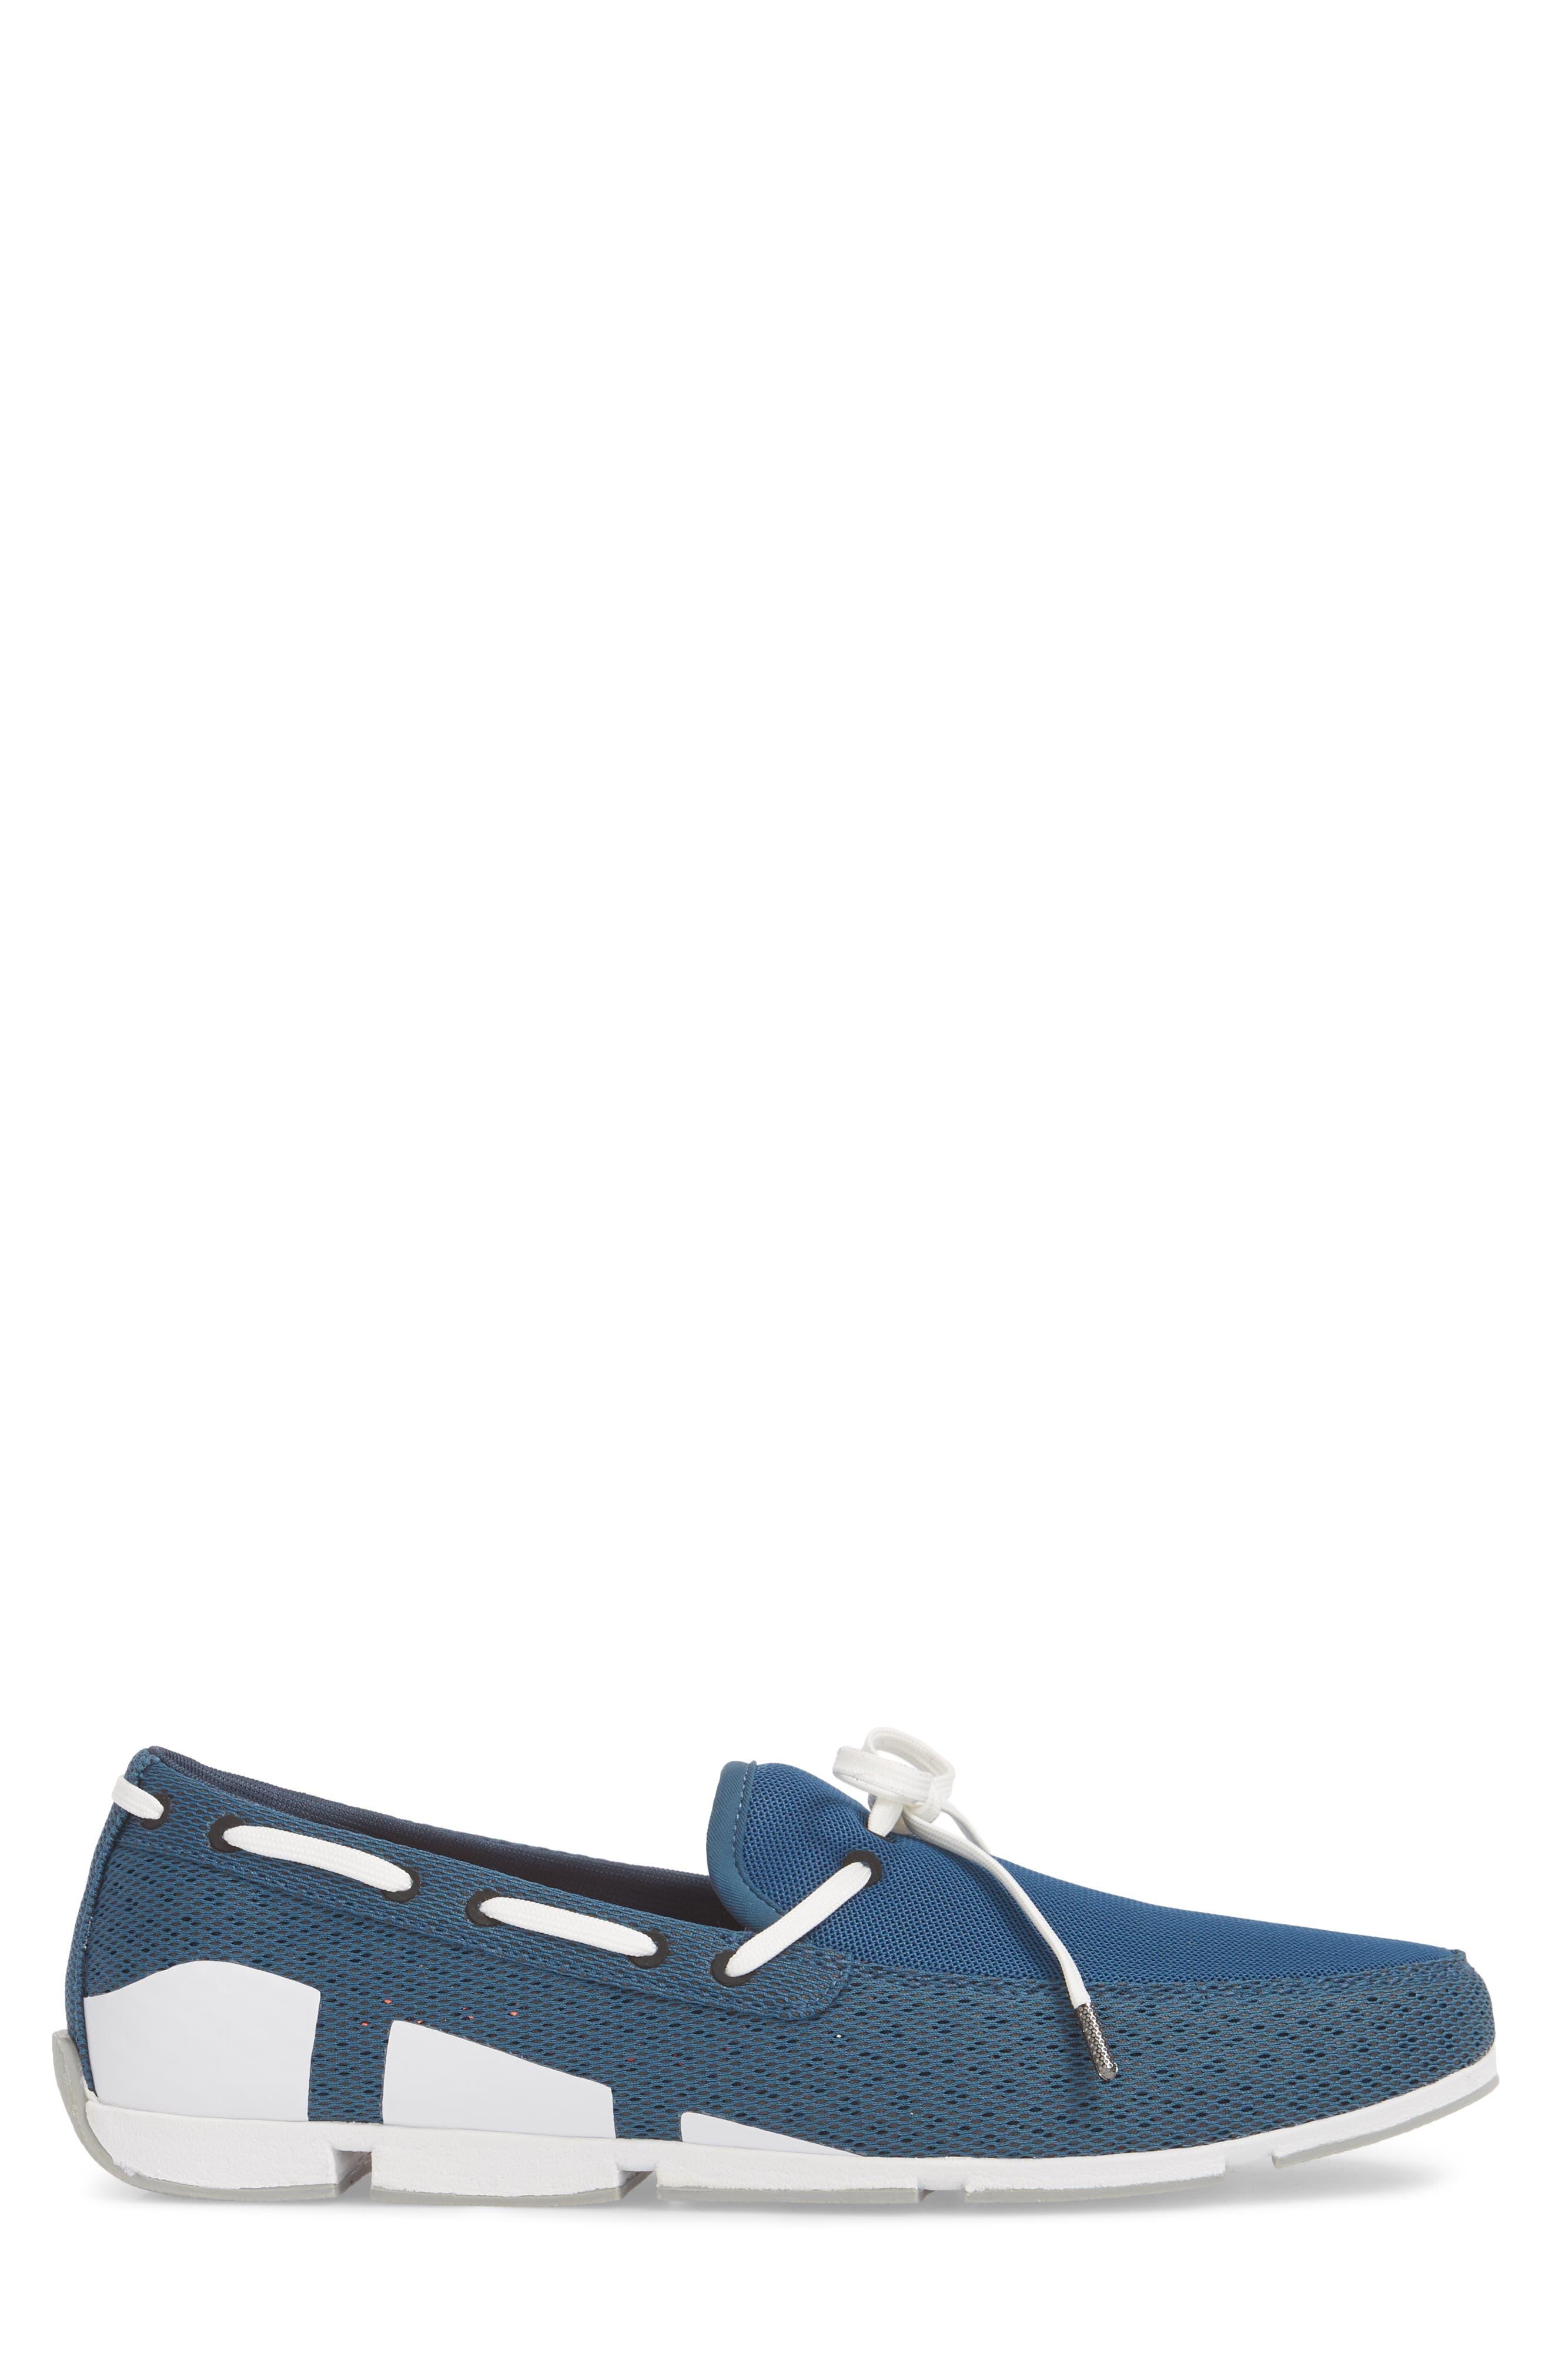 Breeze Loafer,                             Alternate thumbnail 3, color,                             Blue/ White